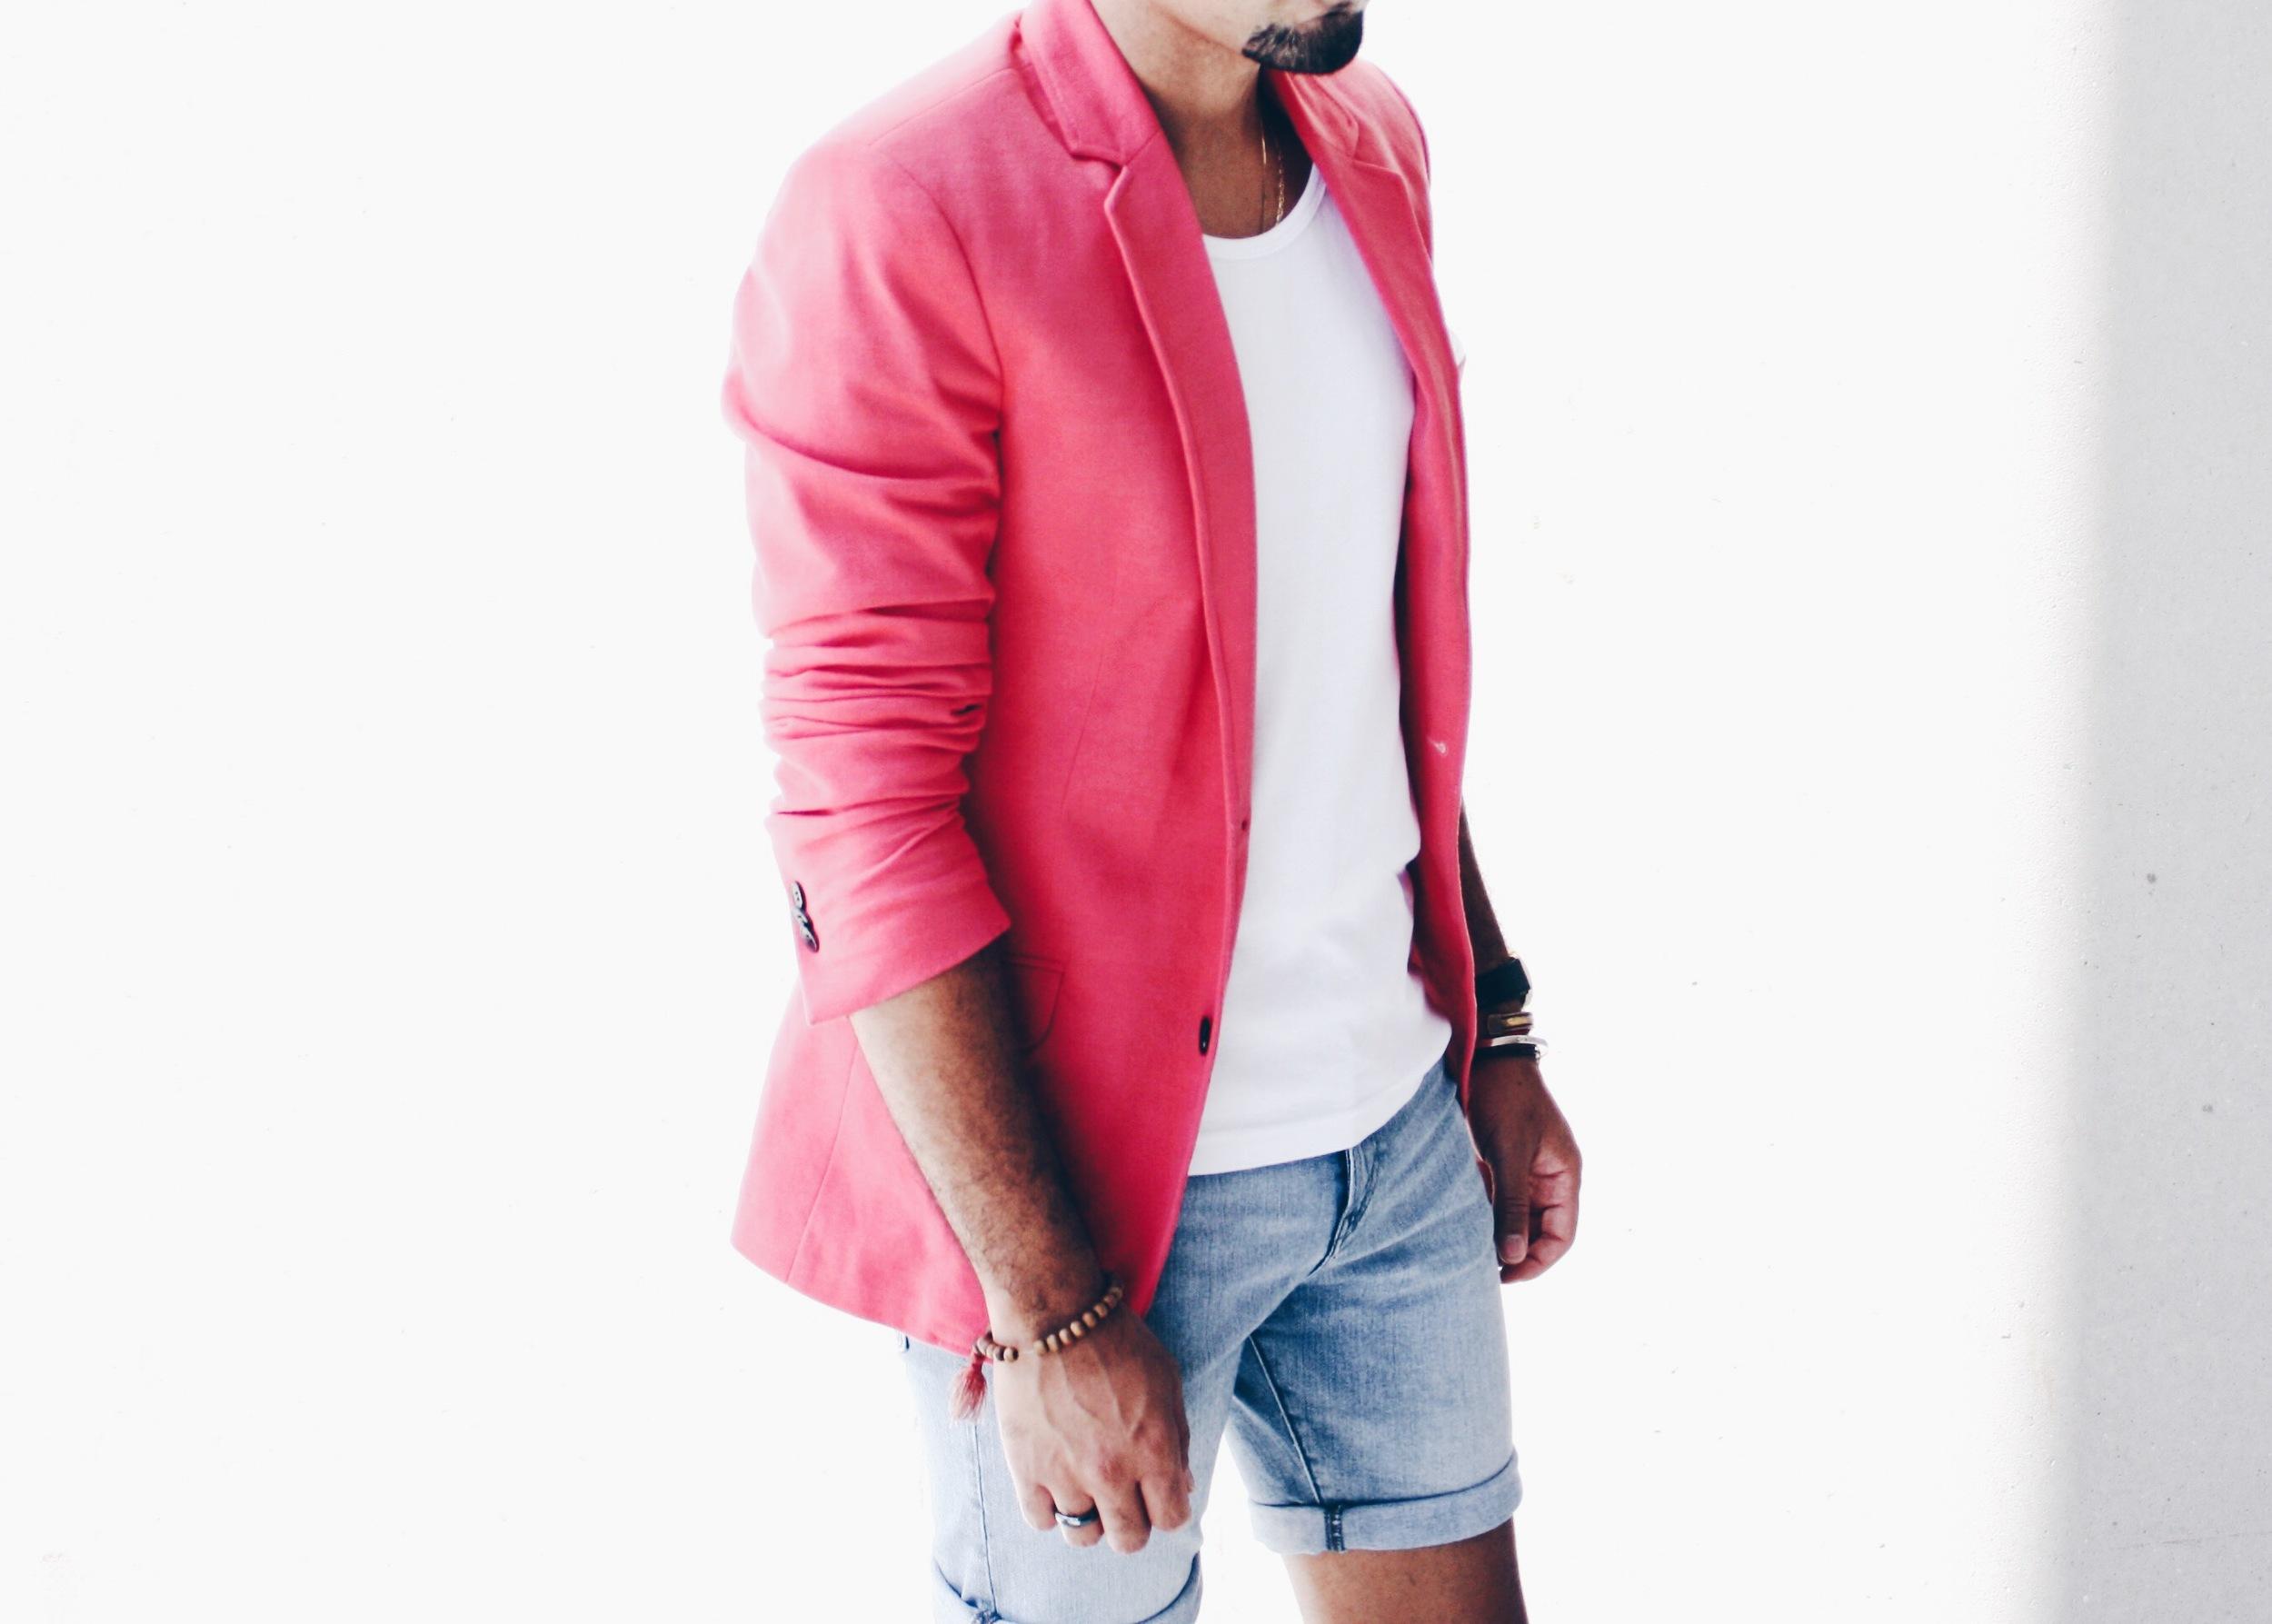 sam-c-perry-pink-blazer-navy-blue-loafer-cropped.jpg